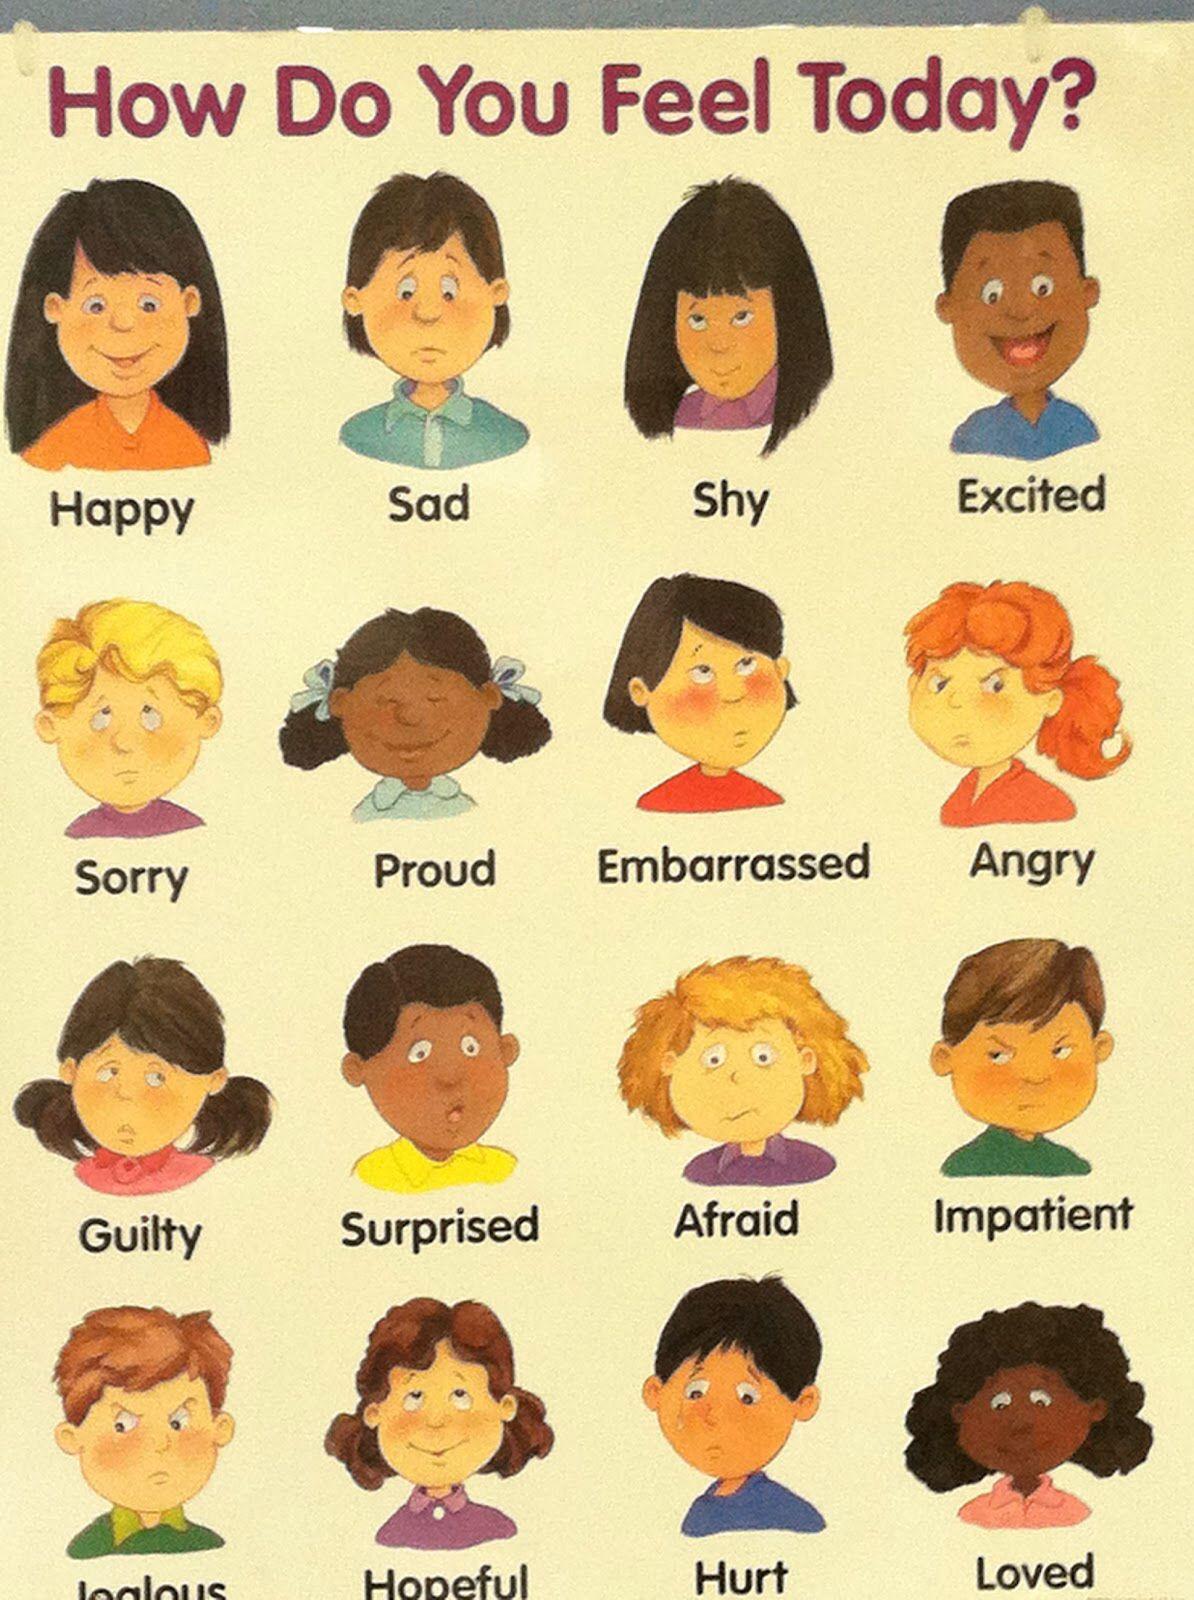 Картинки с эмоциями человека на английскому китайского характерна